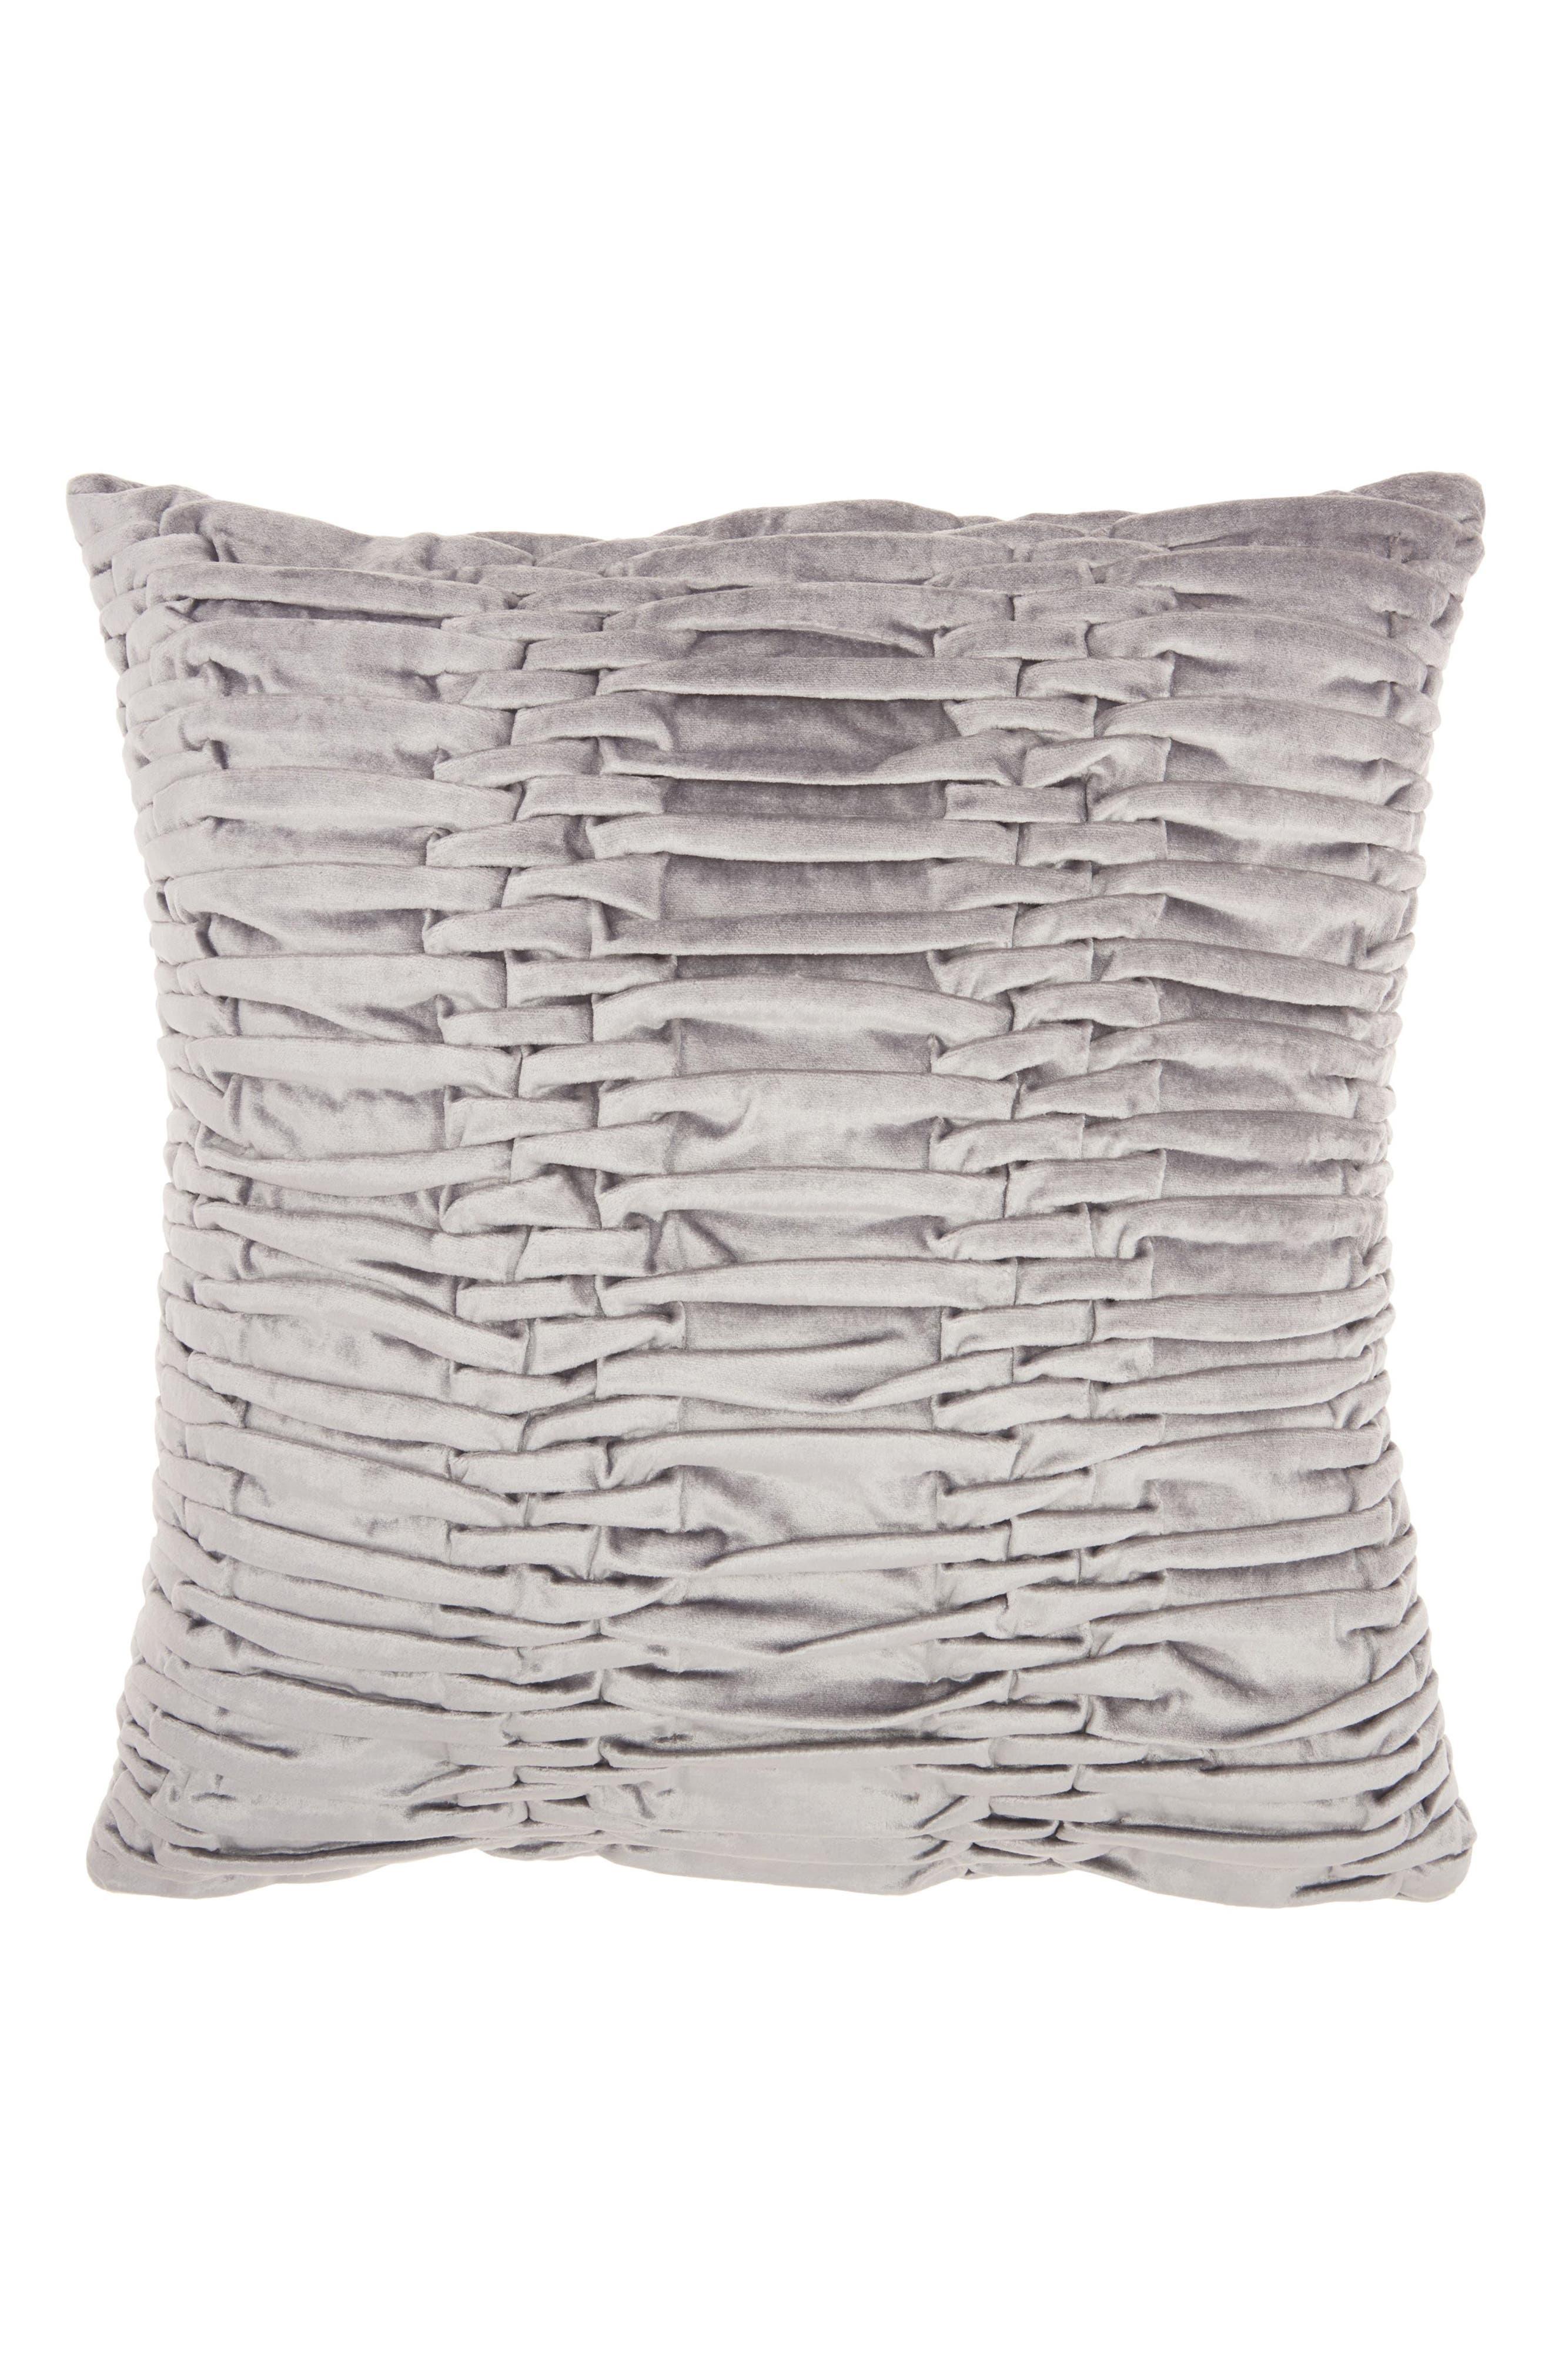 Pleated Velvet Accent Pillow,                         Main,                         color, 020